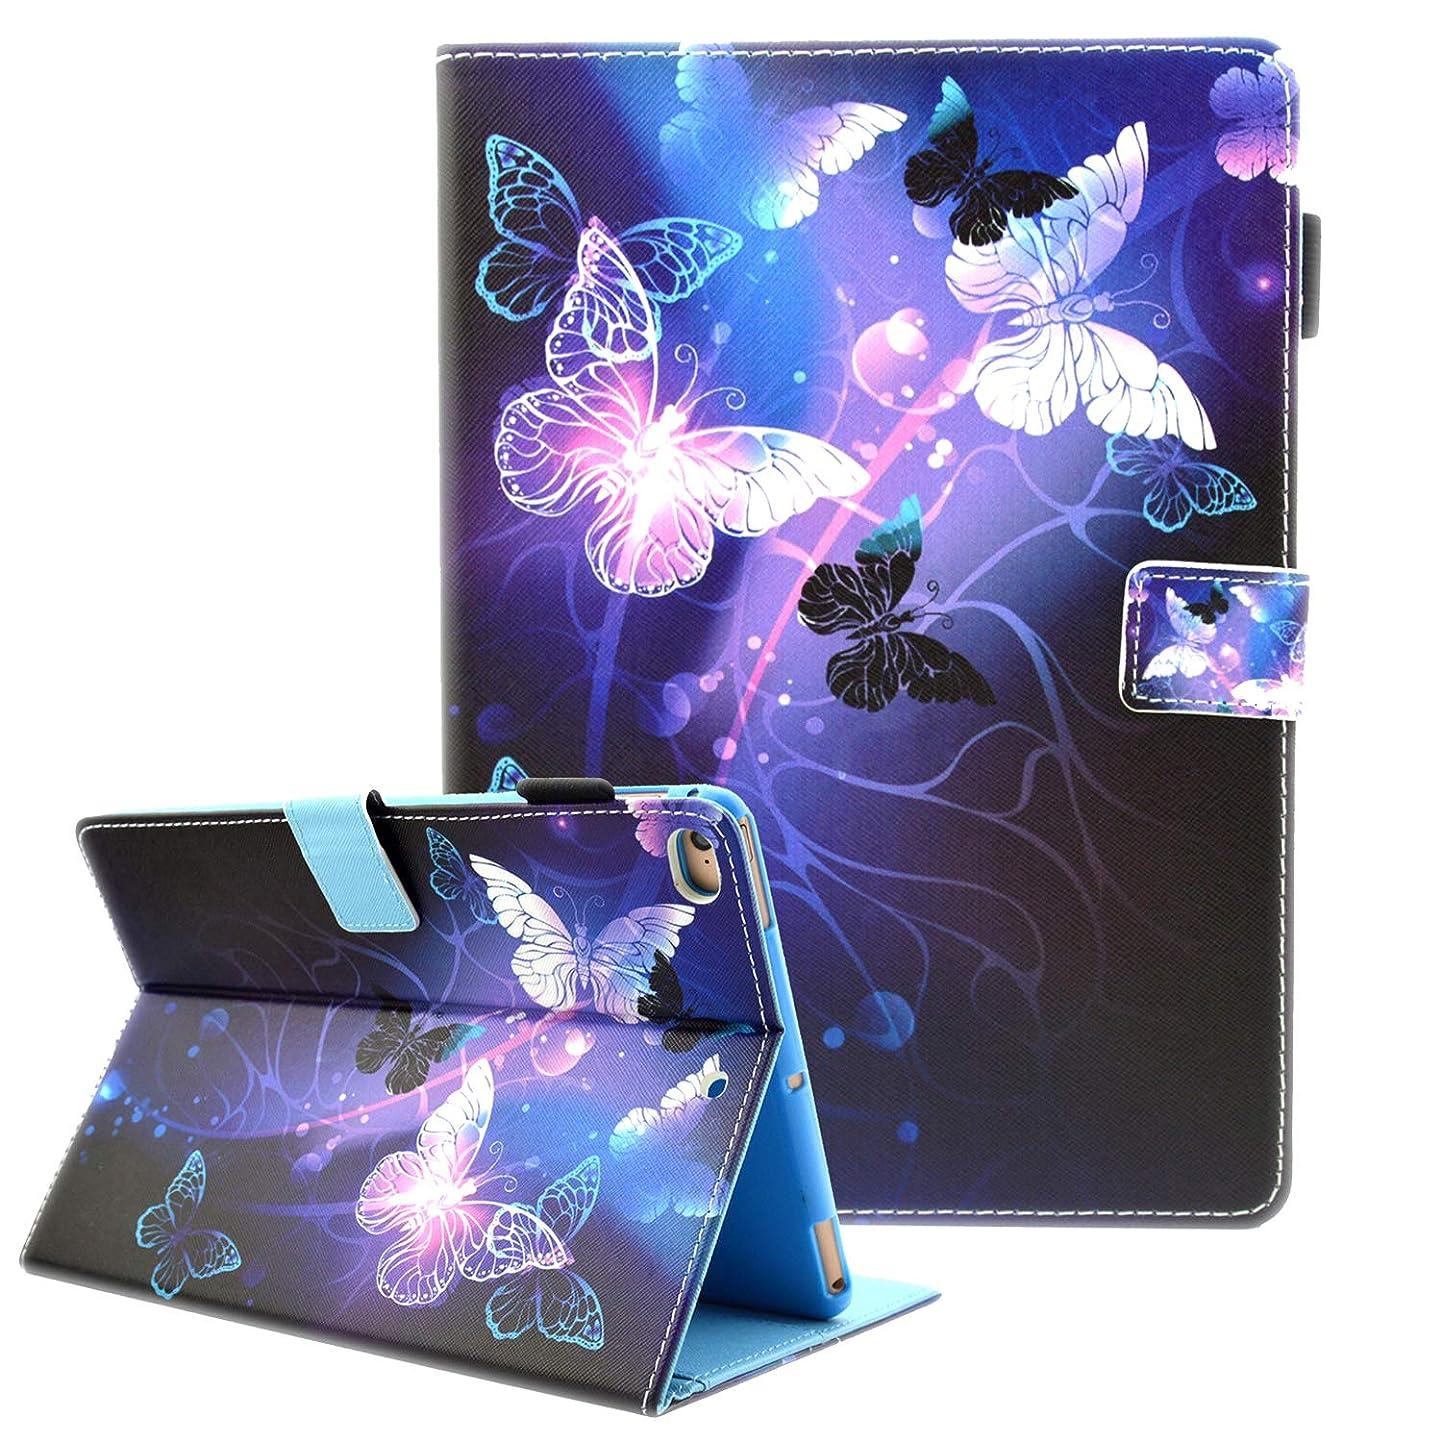 Fvimi iPad Mini Case, iPad Mini 2 Case, iPad Mini 5 Case, iPad Mini 3/4 Case, Multi-Angle Viewing Folio Smart Leather Cover with Auto Sleep/Wake for iPad Mini 1/2/3/4/5 7.9